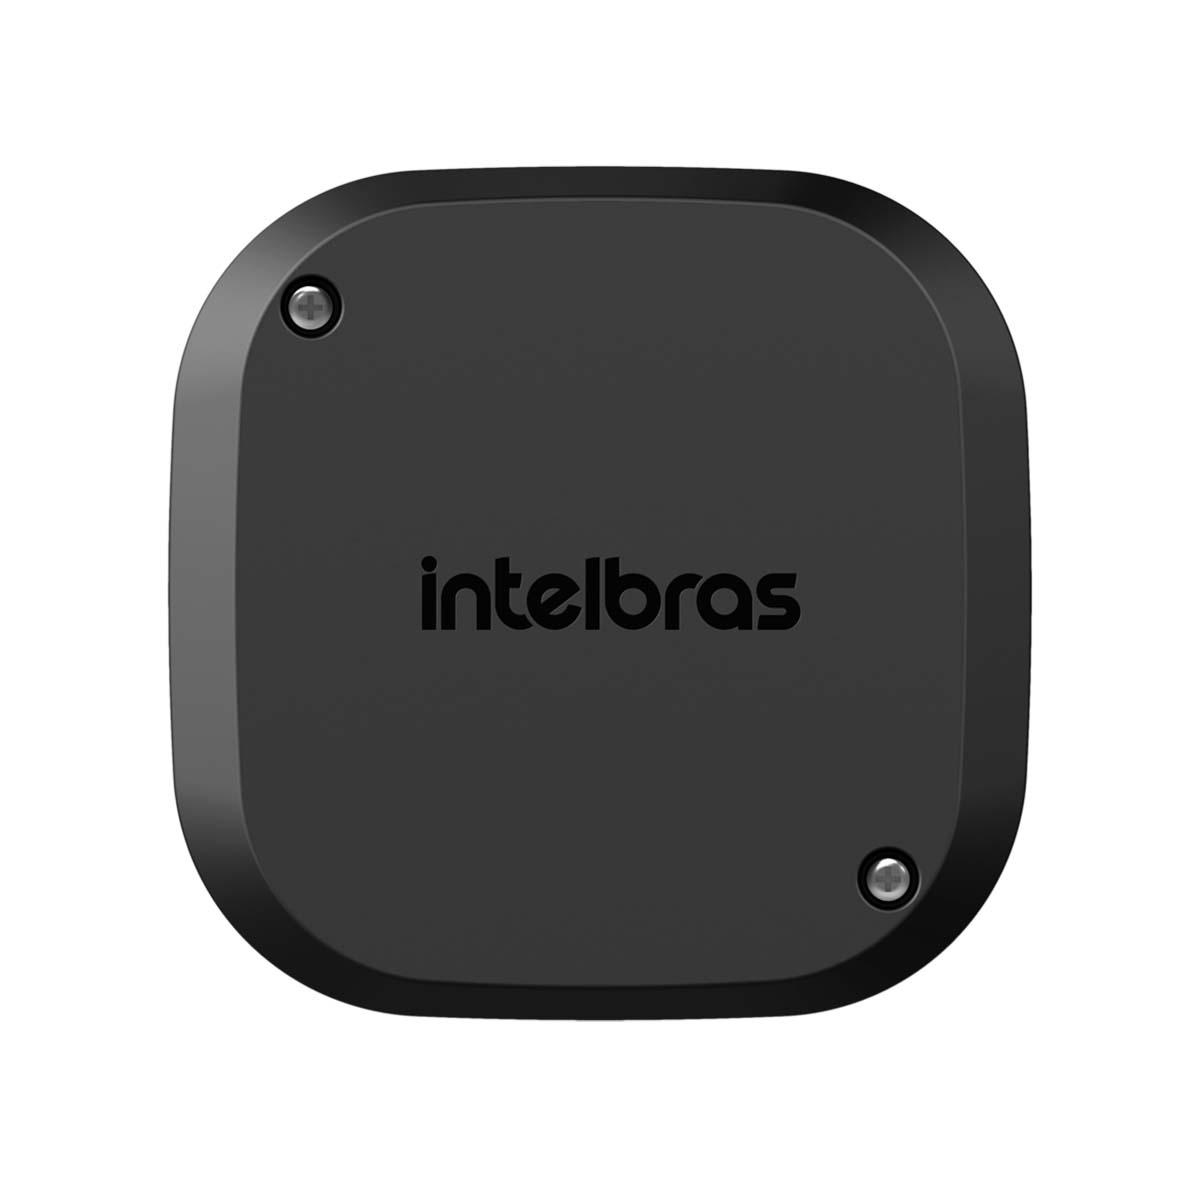 KIT 05 CAIXA PLASTICA DE PASSAGEM INTELBRAS VBOX 1100 BLACK